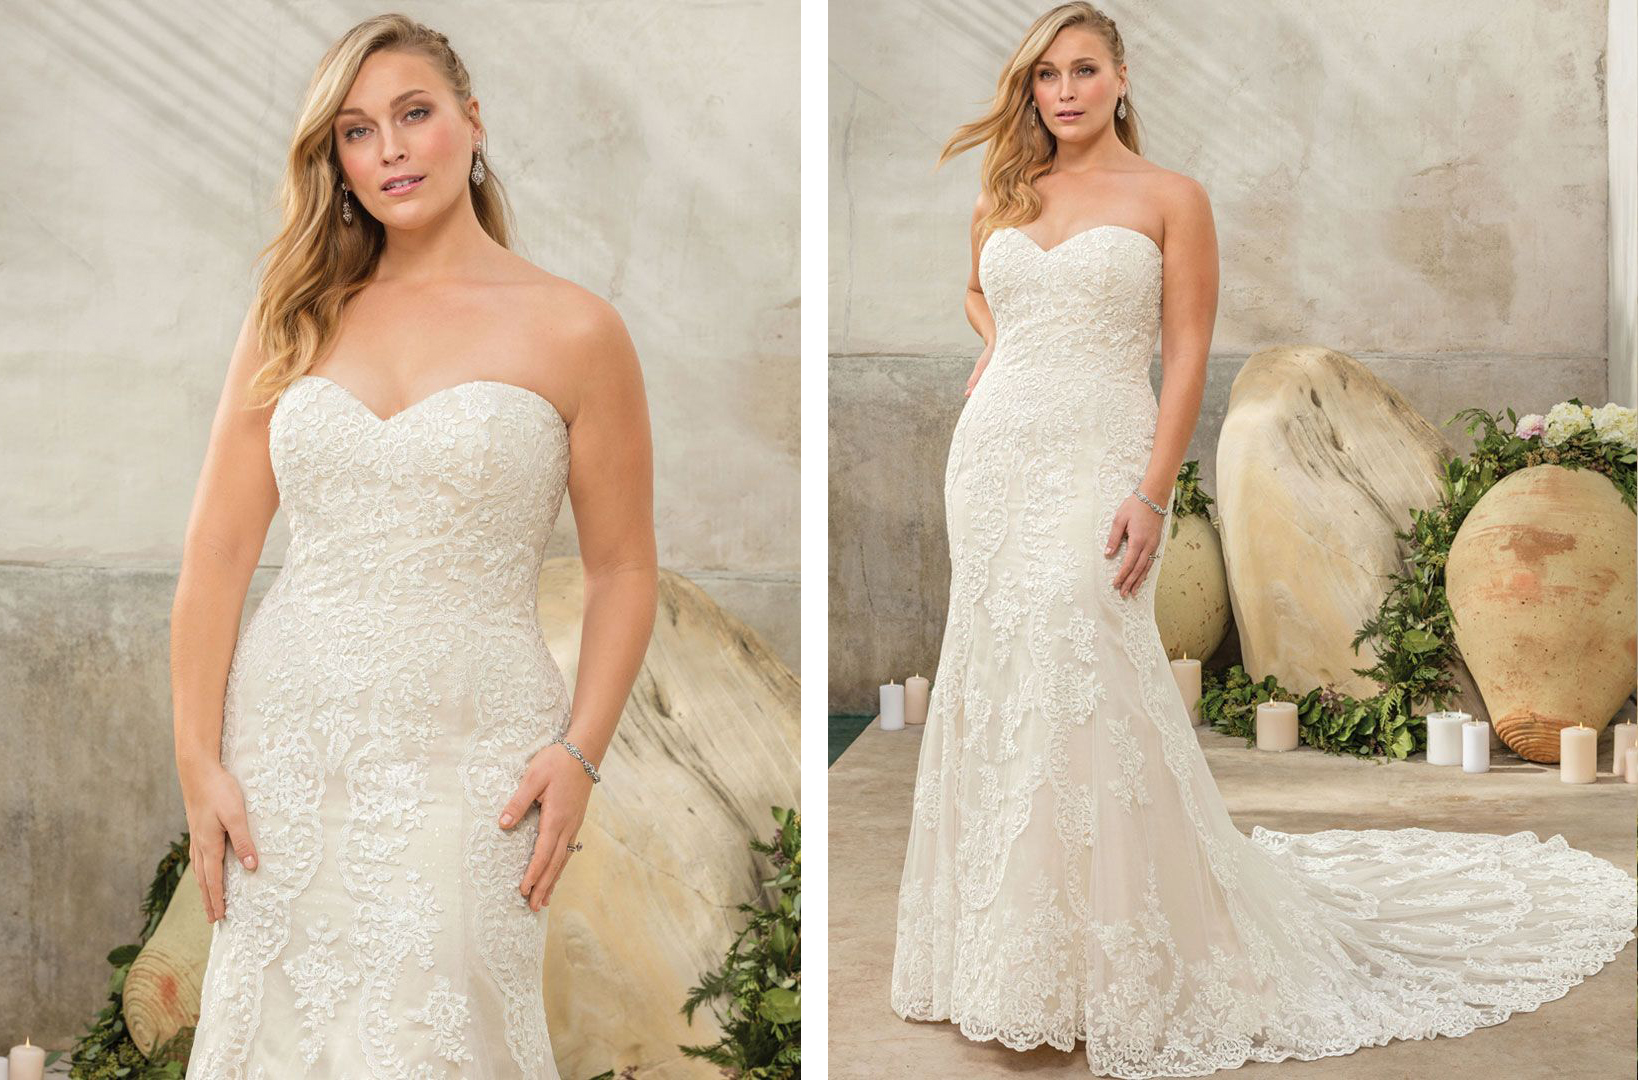 Top Plus Size Wedding Dresses under $1,500 by Casablanca ...